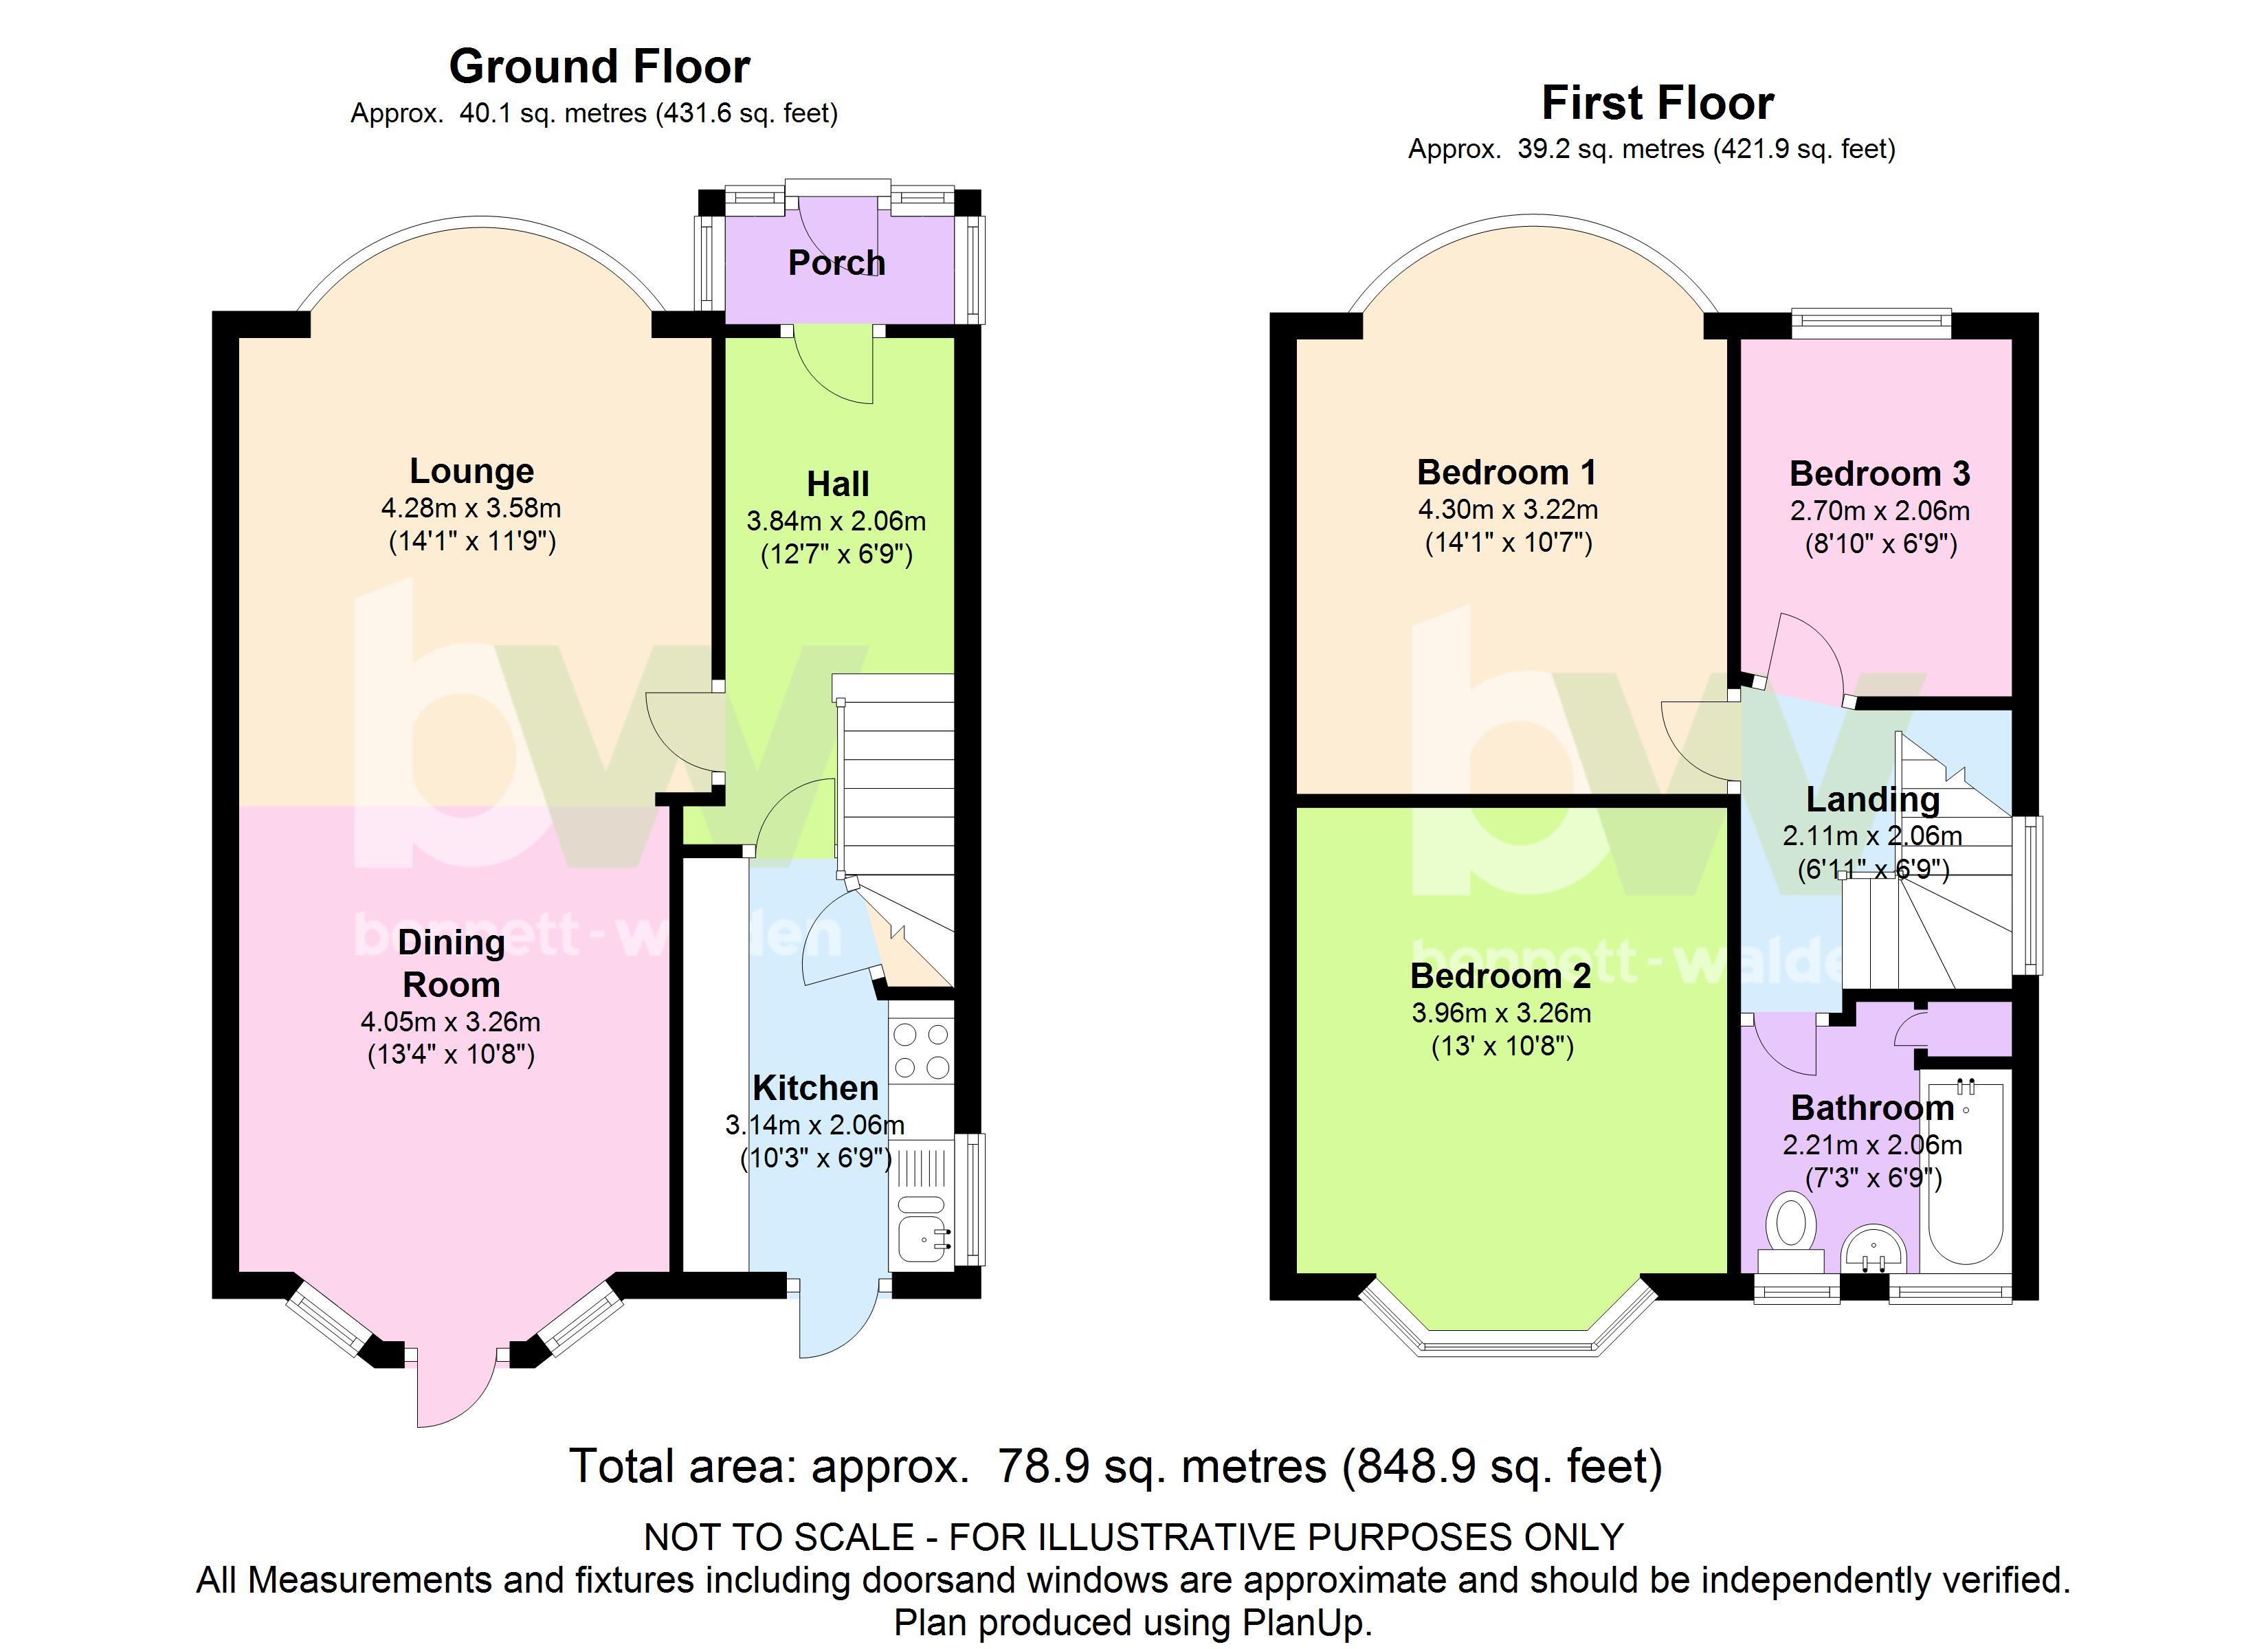 estate agent house plans house plans On floor plans for estate agents